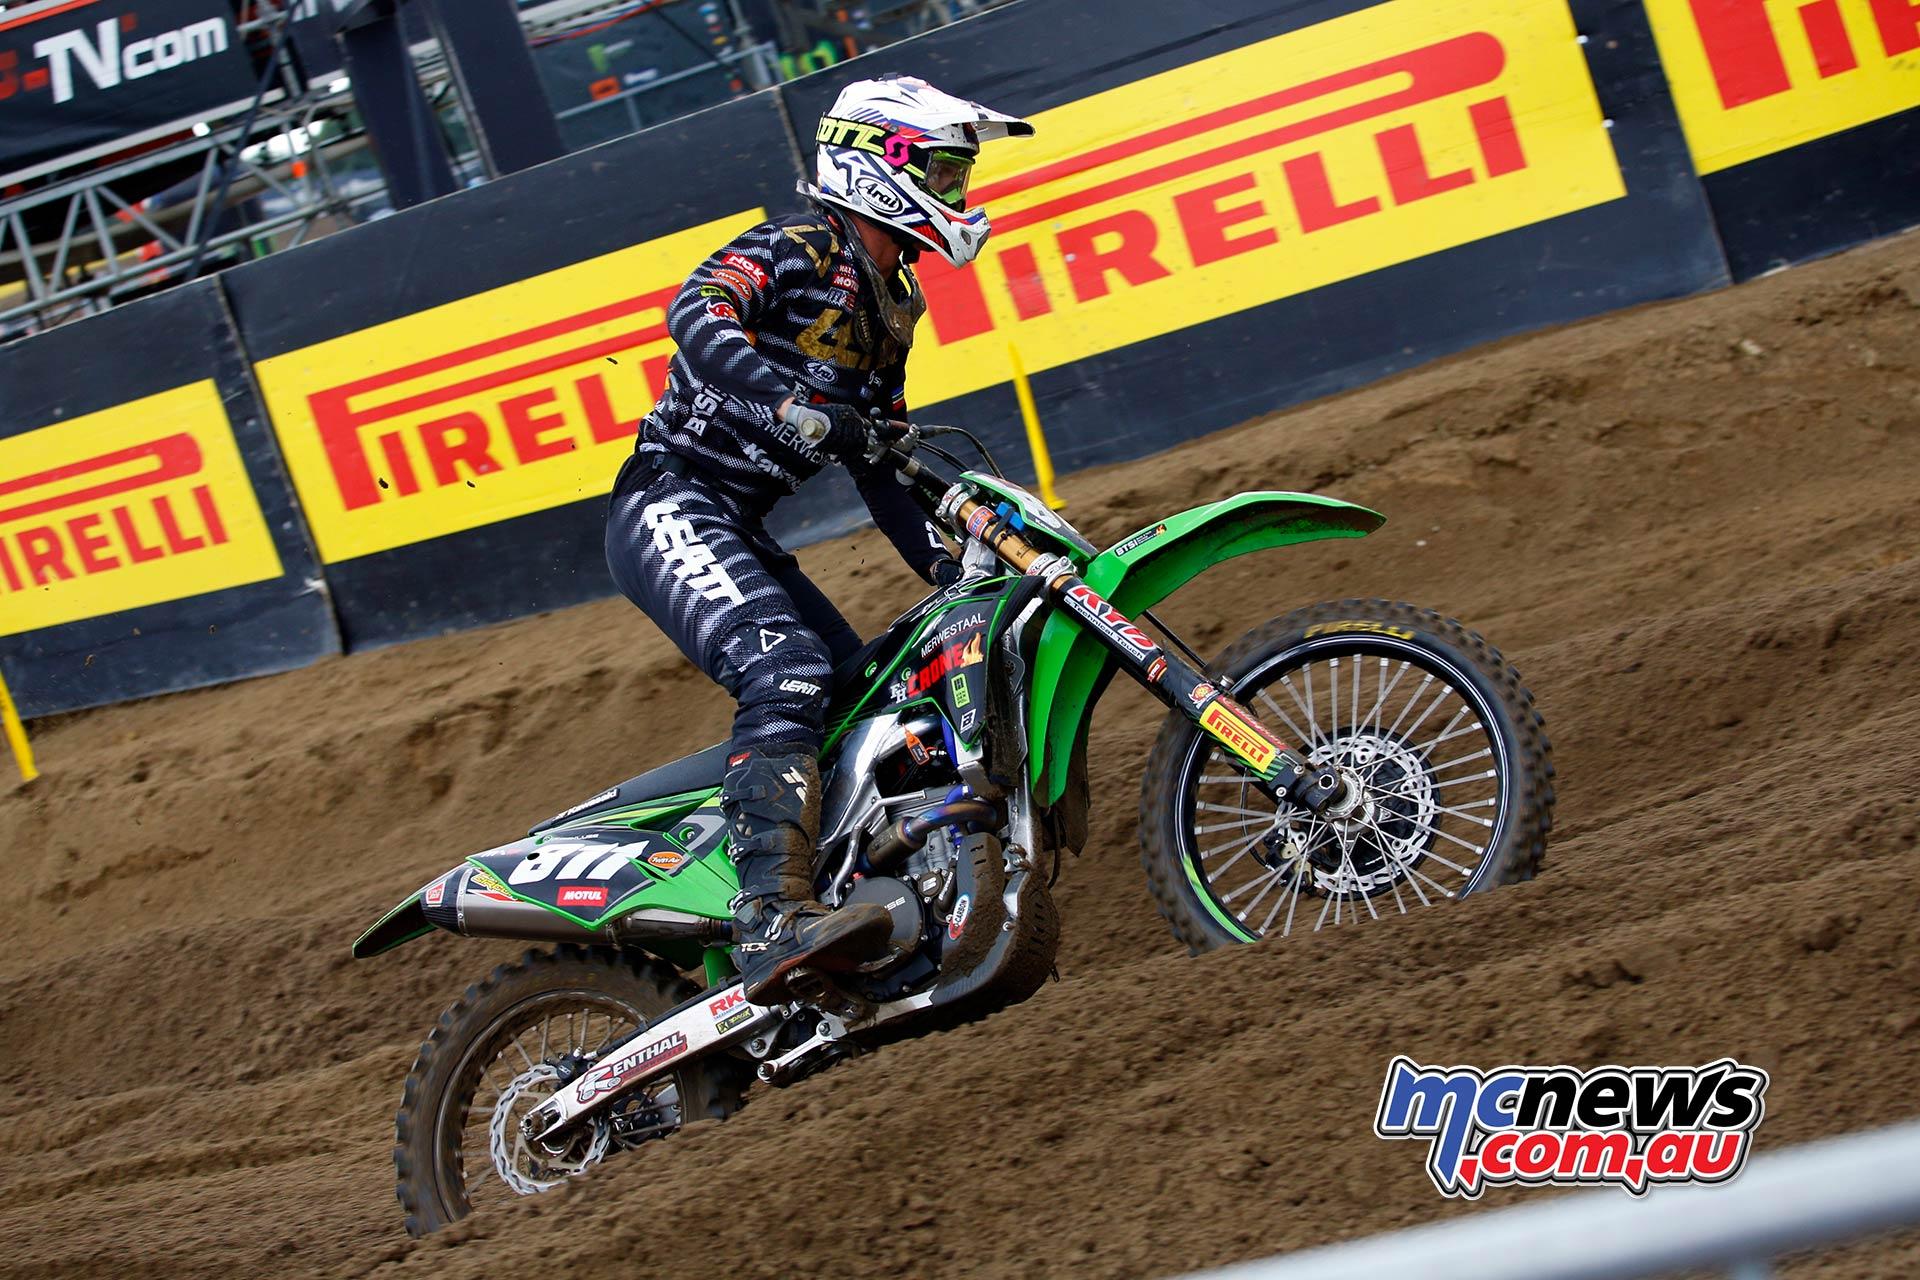 MXGP Rnd Belgium Pirelli Adam Sterry